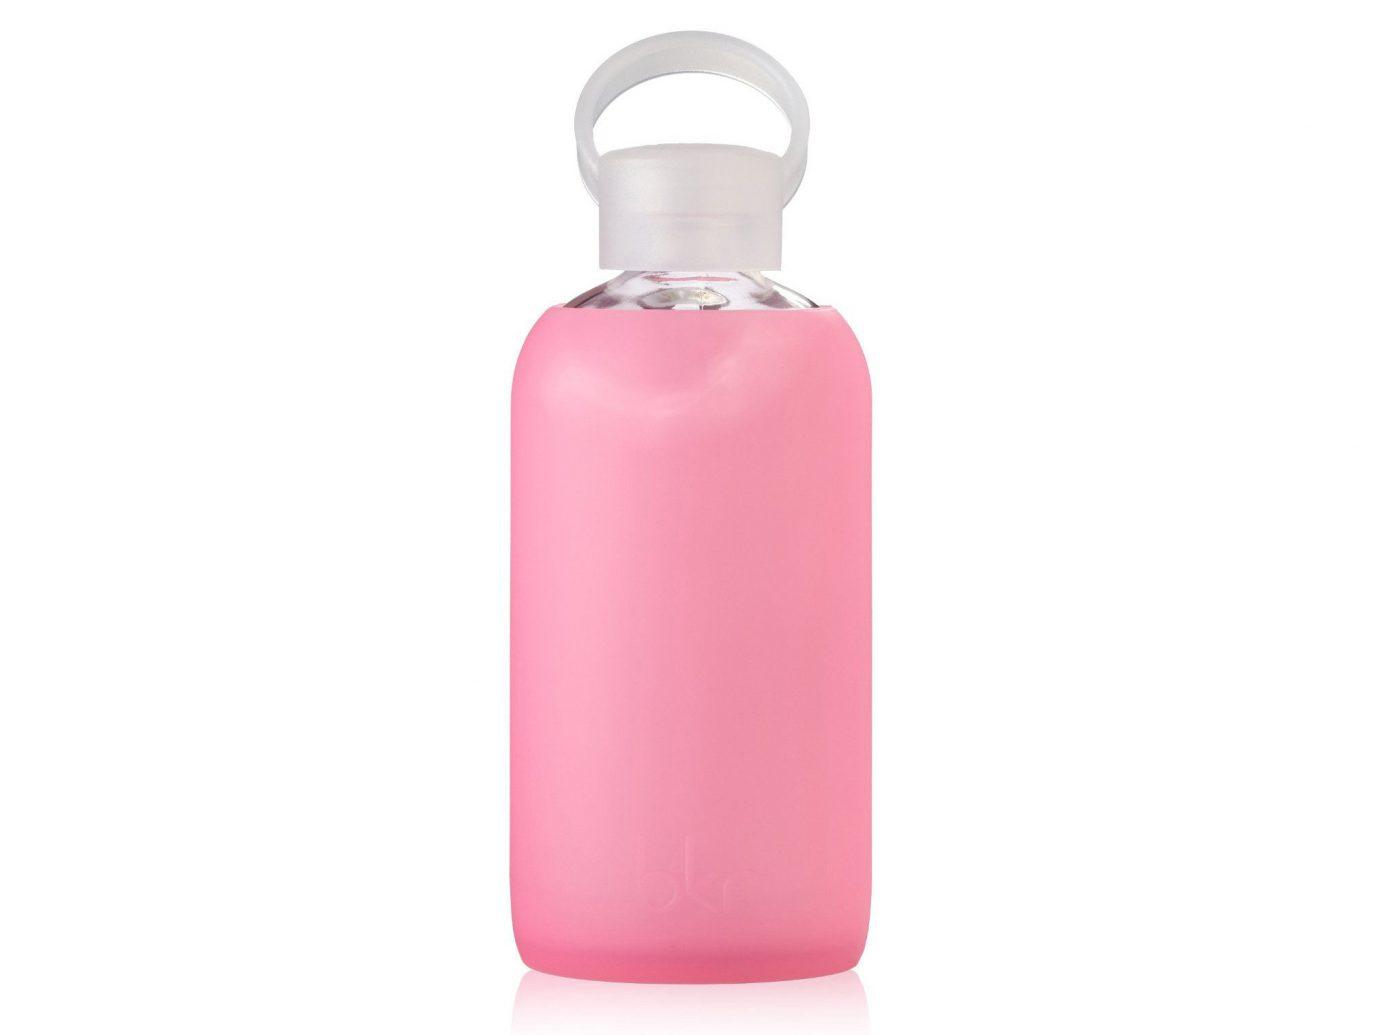 Health + Wellness Travel Tips toiletry pink bottle drinkware product glass bottle magenta plastic bottle tableware